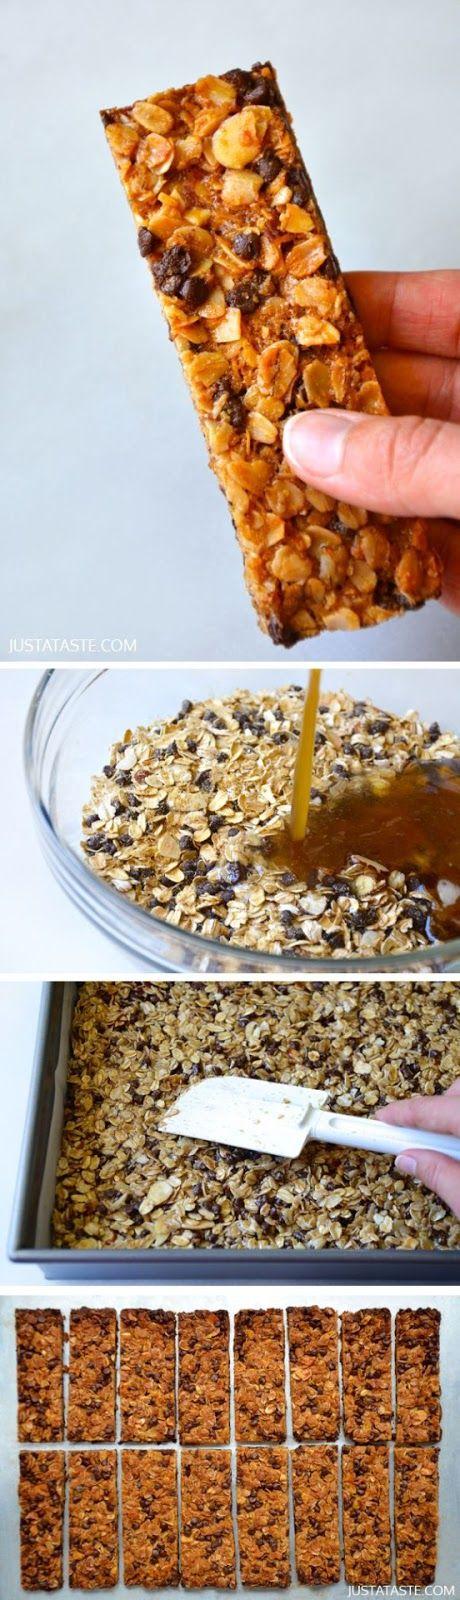 Easy Homemade Chocolate Chip Granola Bars #recipe View The Recipe Details